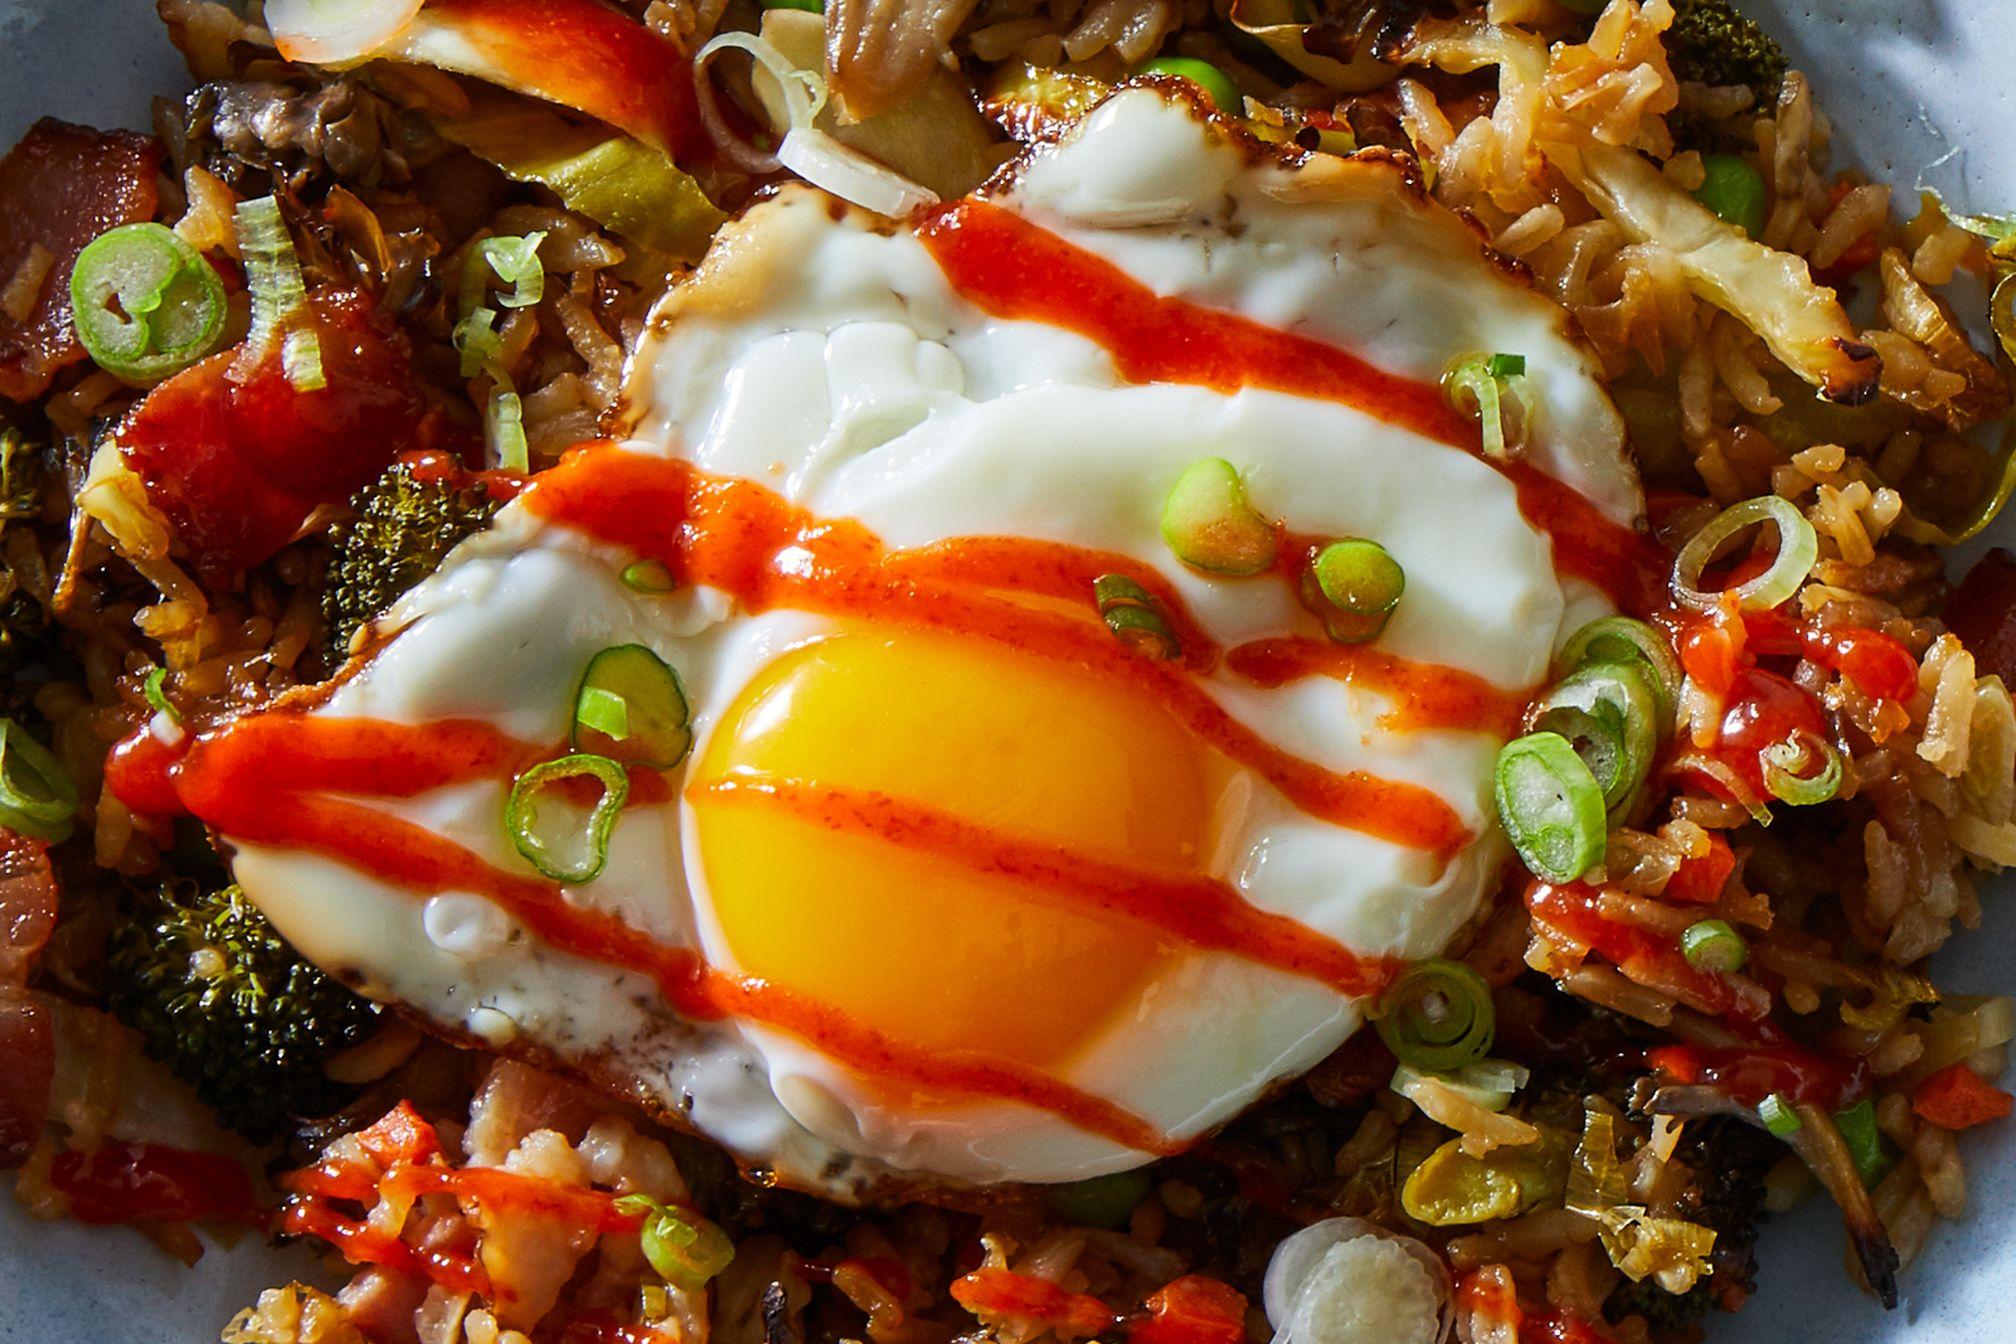 Sheet-Pan Crispy Rice with Bacon and Broccoli